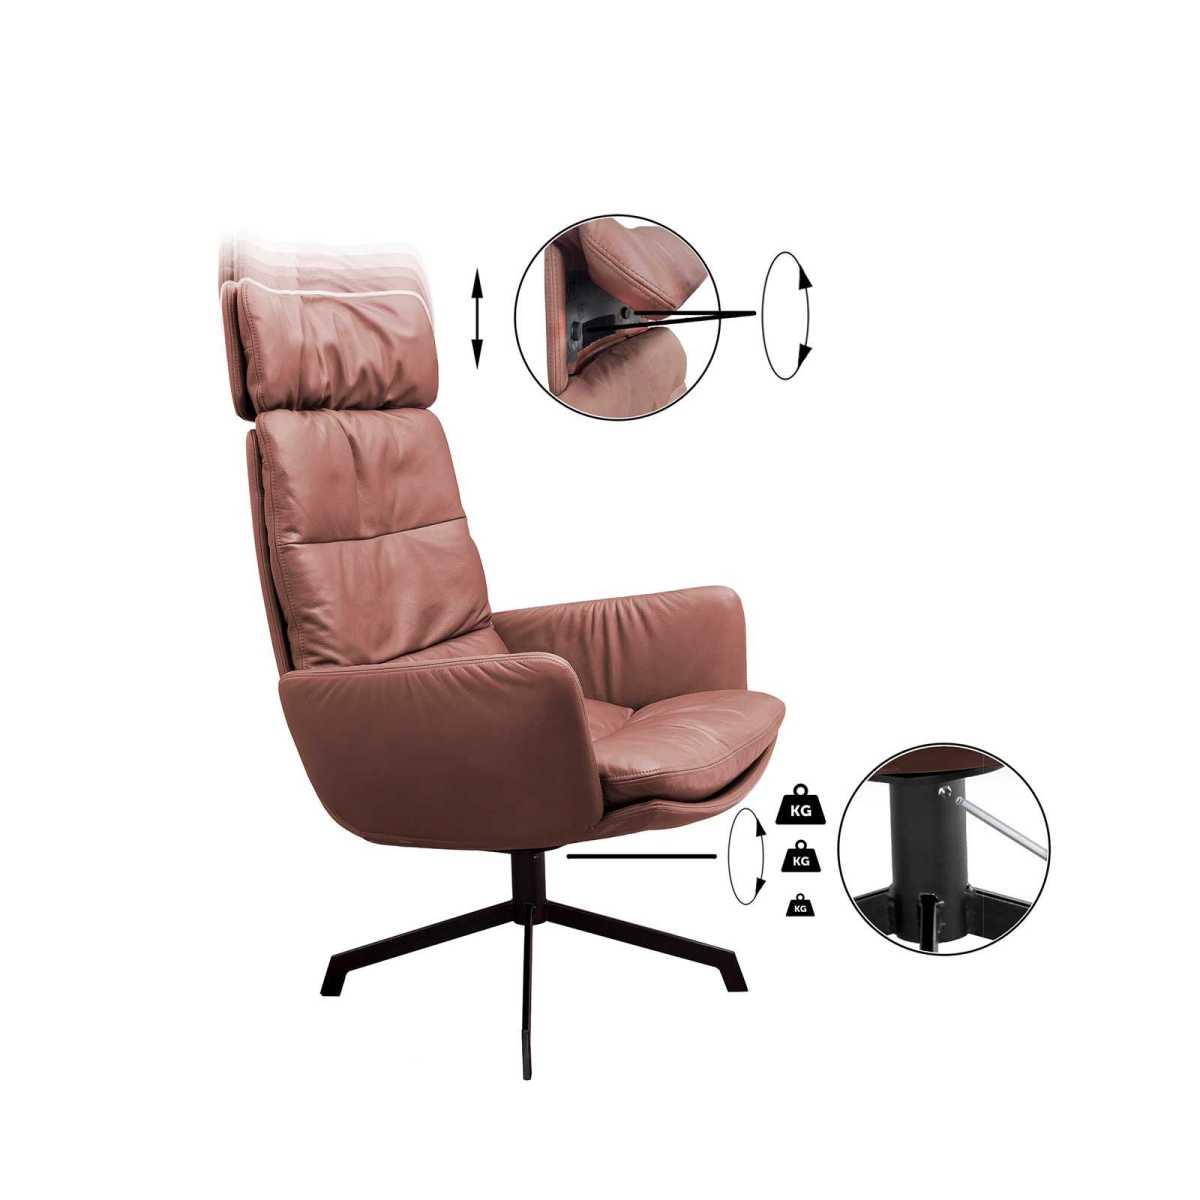 Arva Lounge KFF Sessel drehbar 4-Fuss-Stern-Gestell